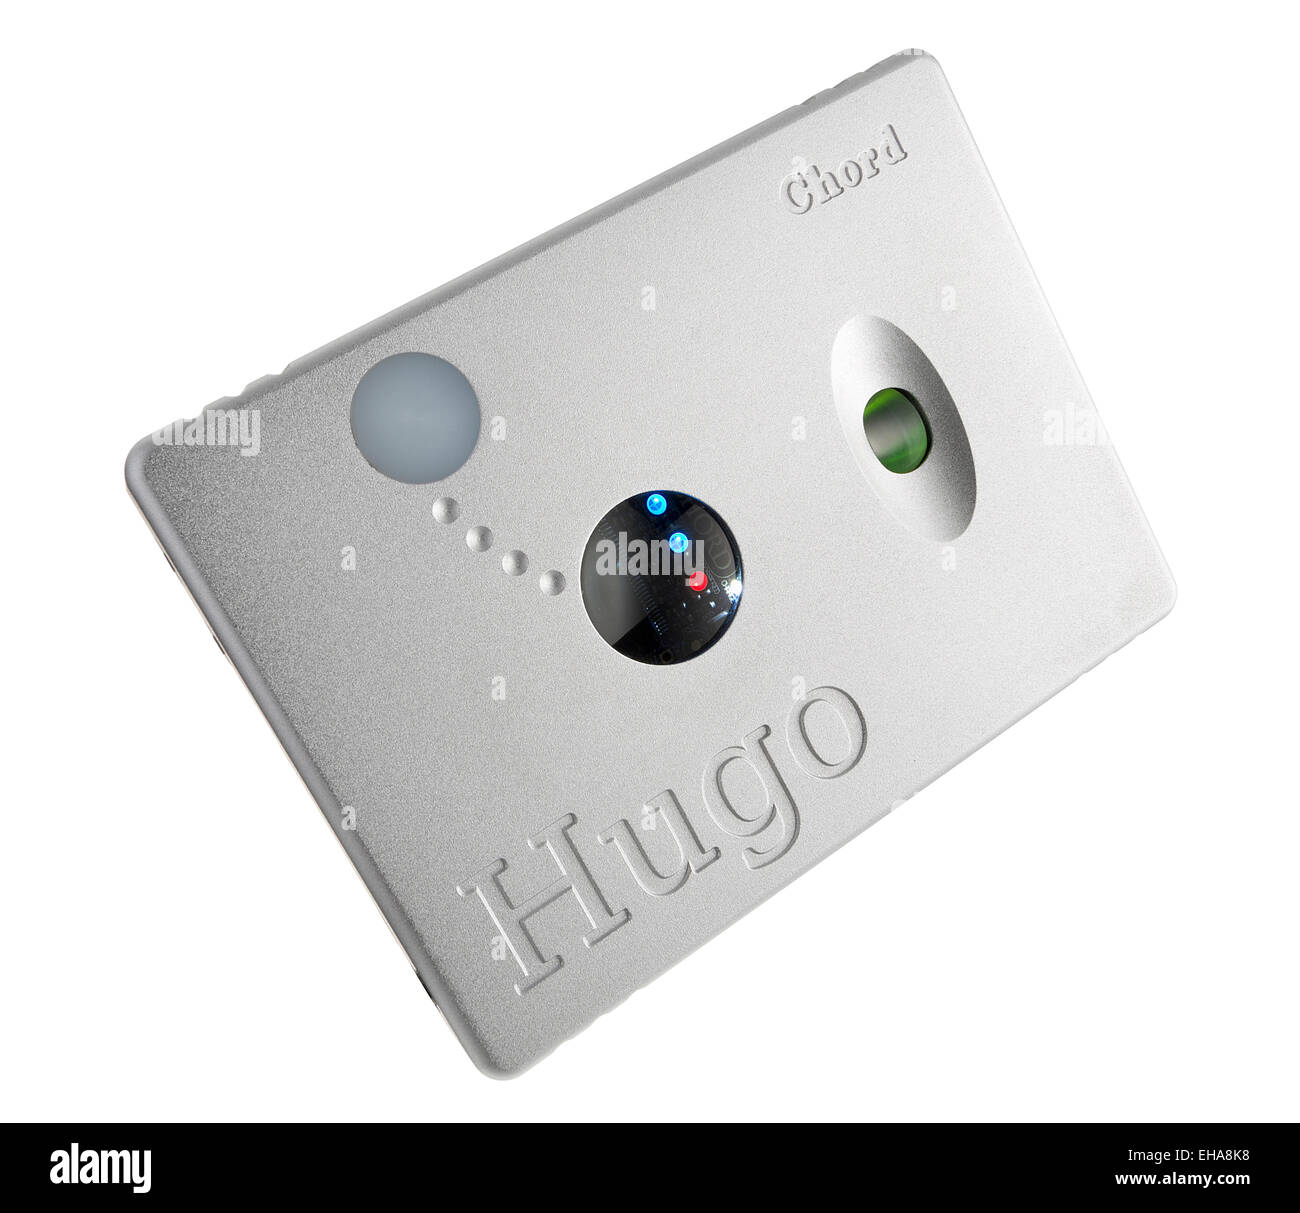 Hugo d'accord. Amplificateur de casque DAC / Mobile. Chord Electronics digital audio converter. Photo Stock